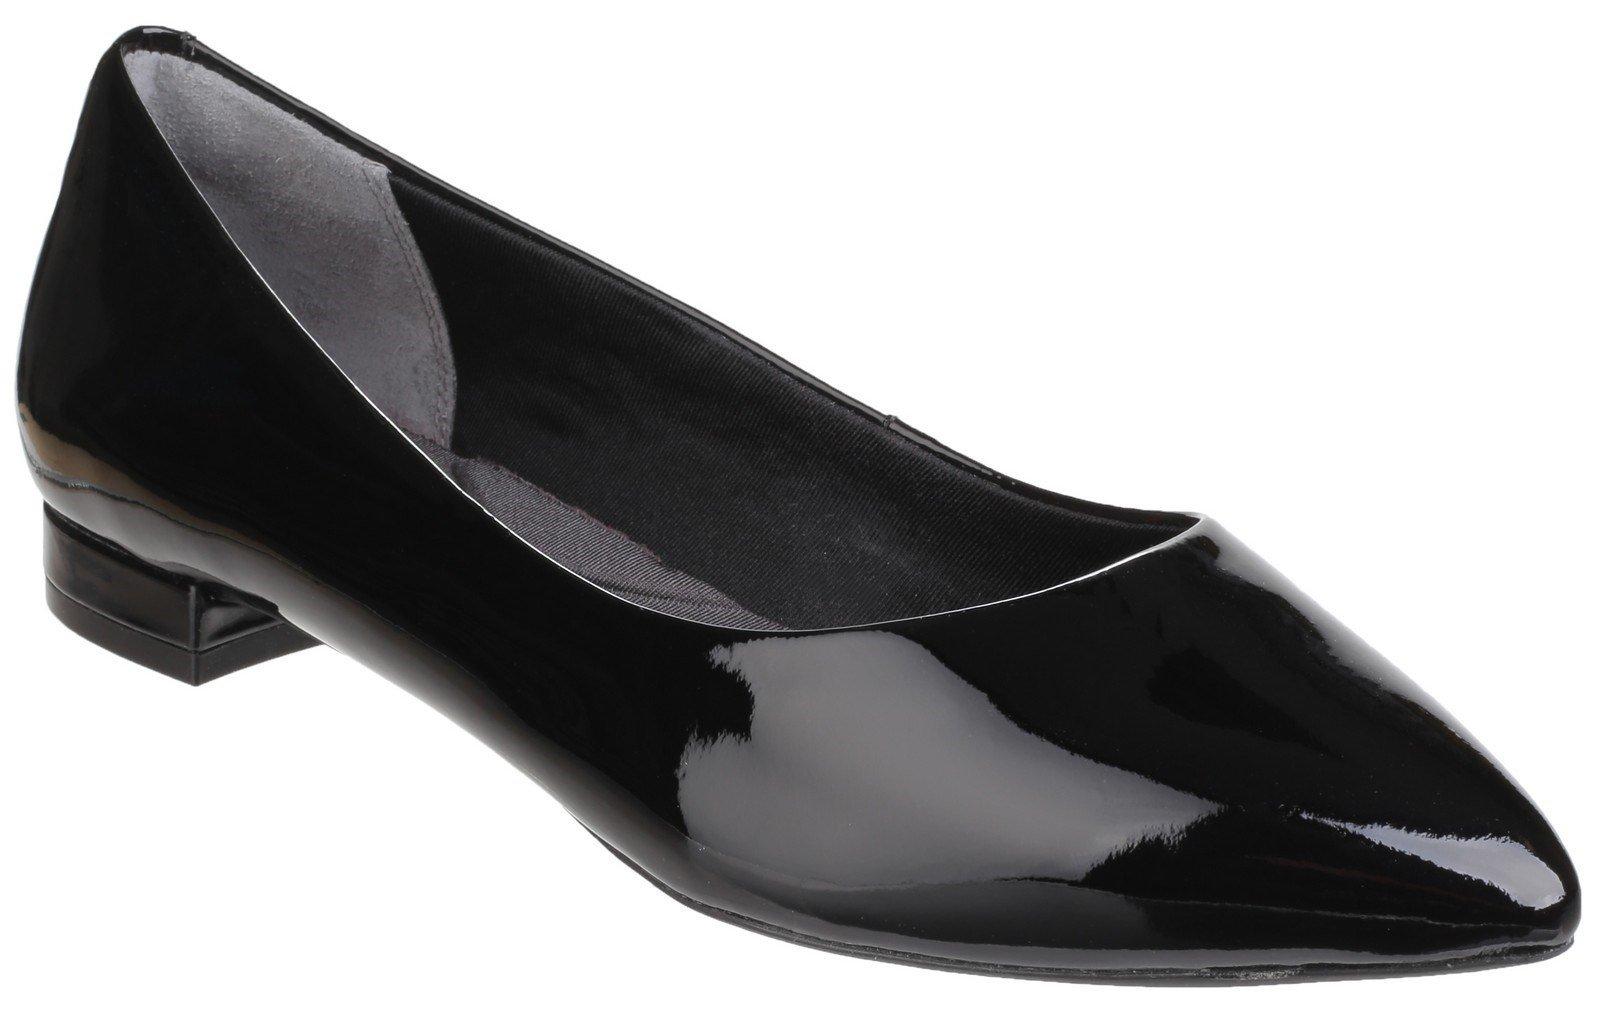 Rockport Women's Total Motion Adelyn Flat Shoe Black Patent 24787 - Black Patent 4